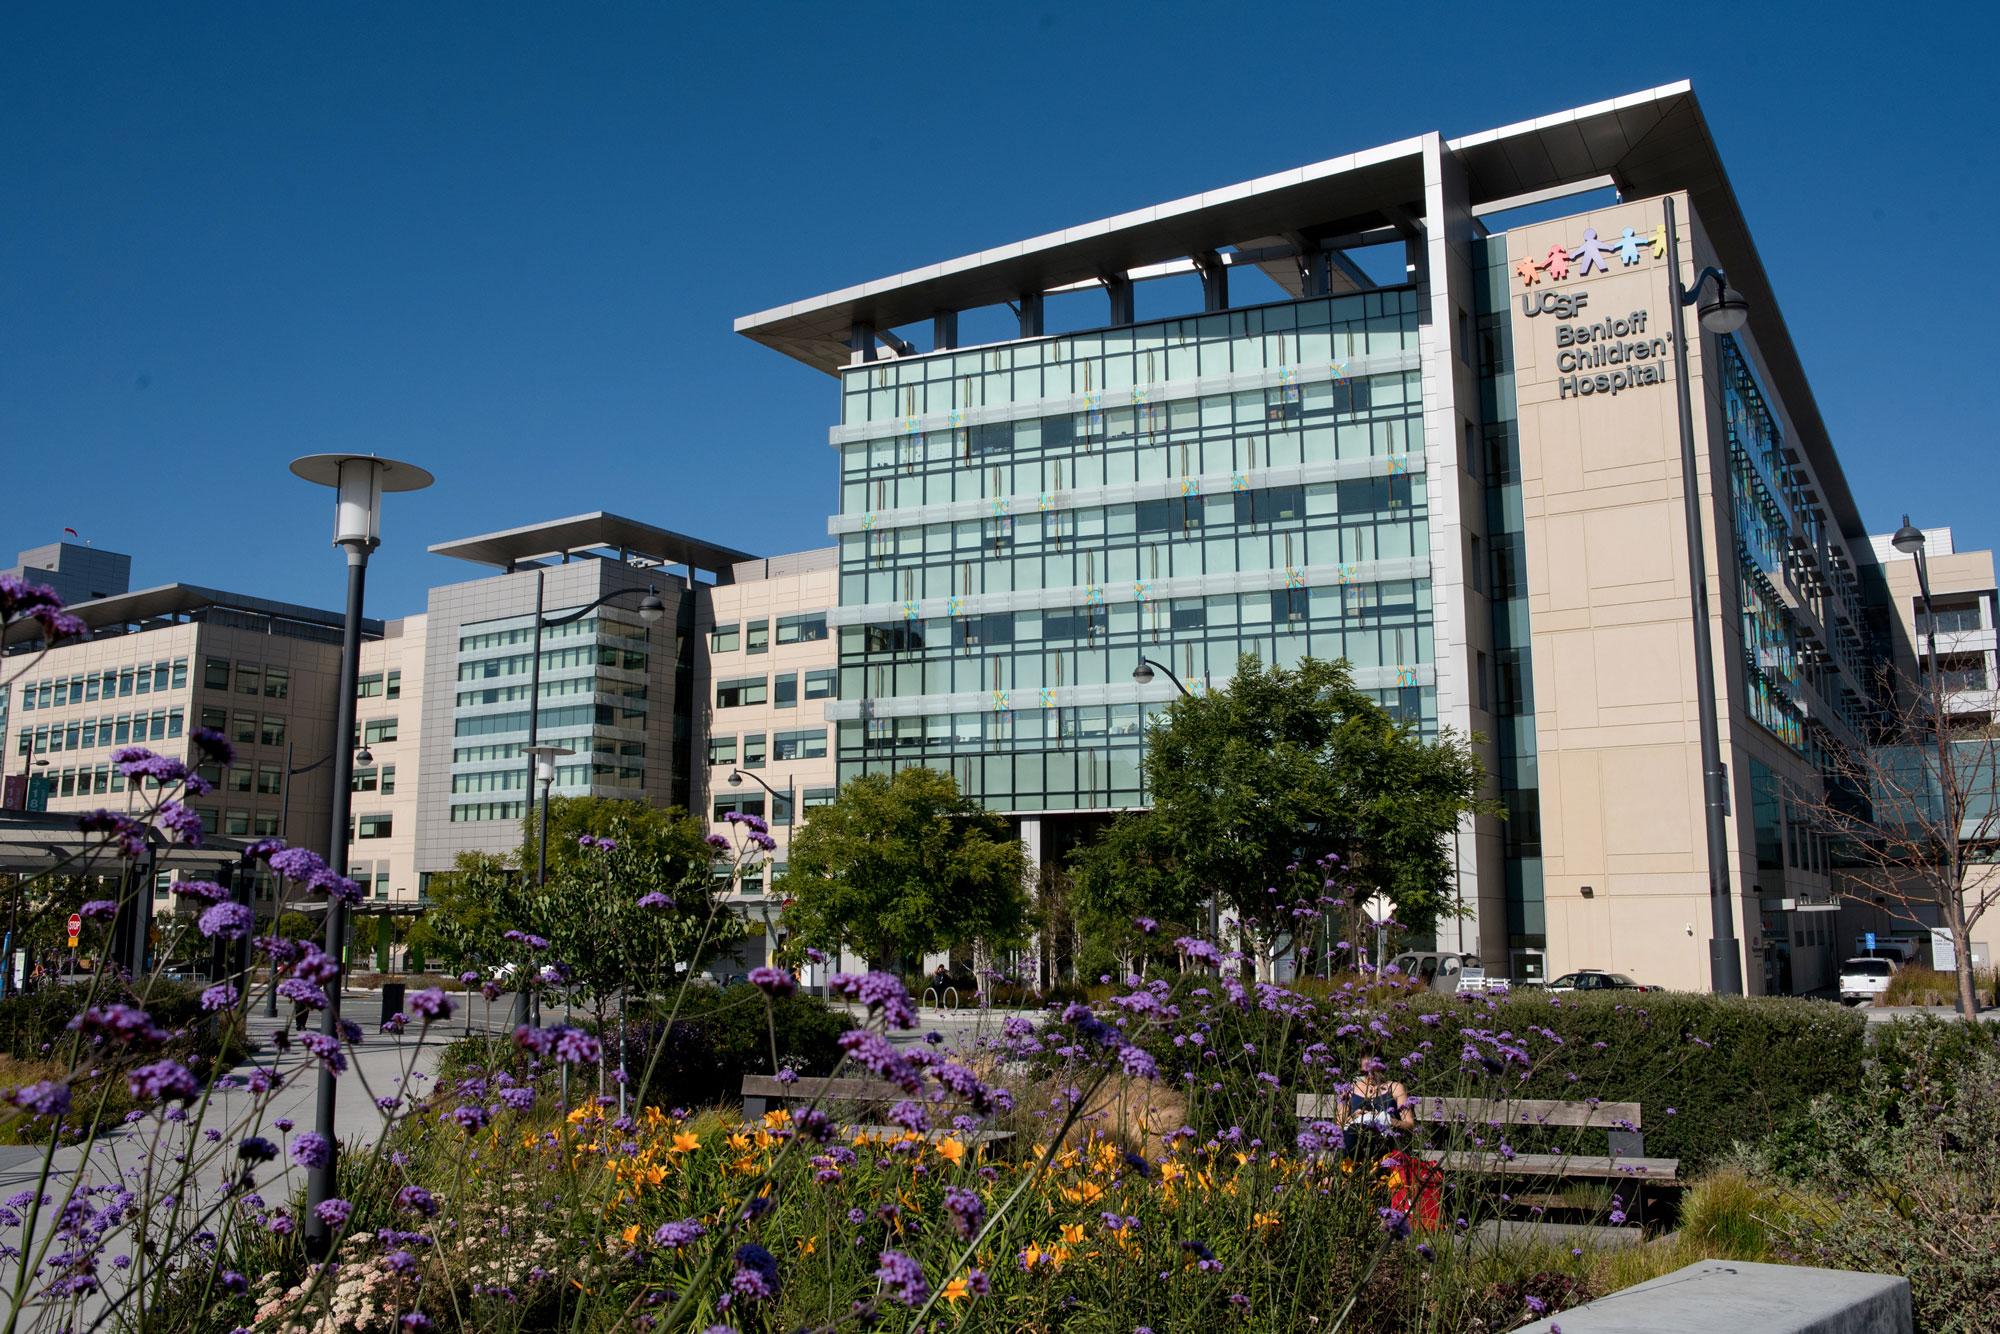 Press Kit: UCSF Benioff Children's Hospitals | UC San Francisco